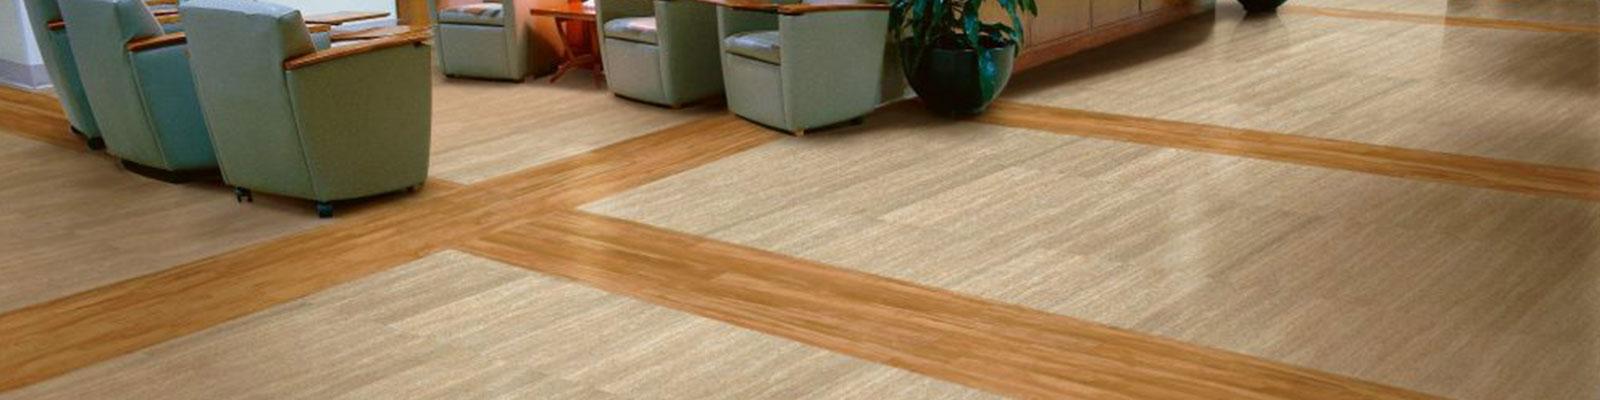 Importance of vinyl Flooring